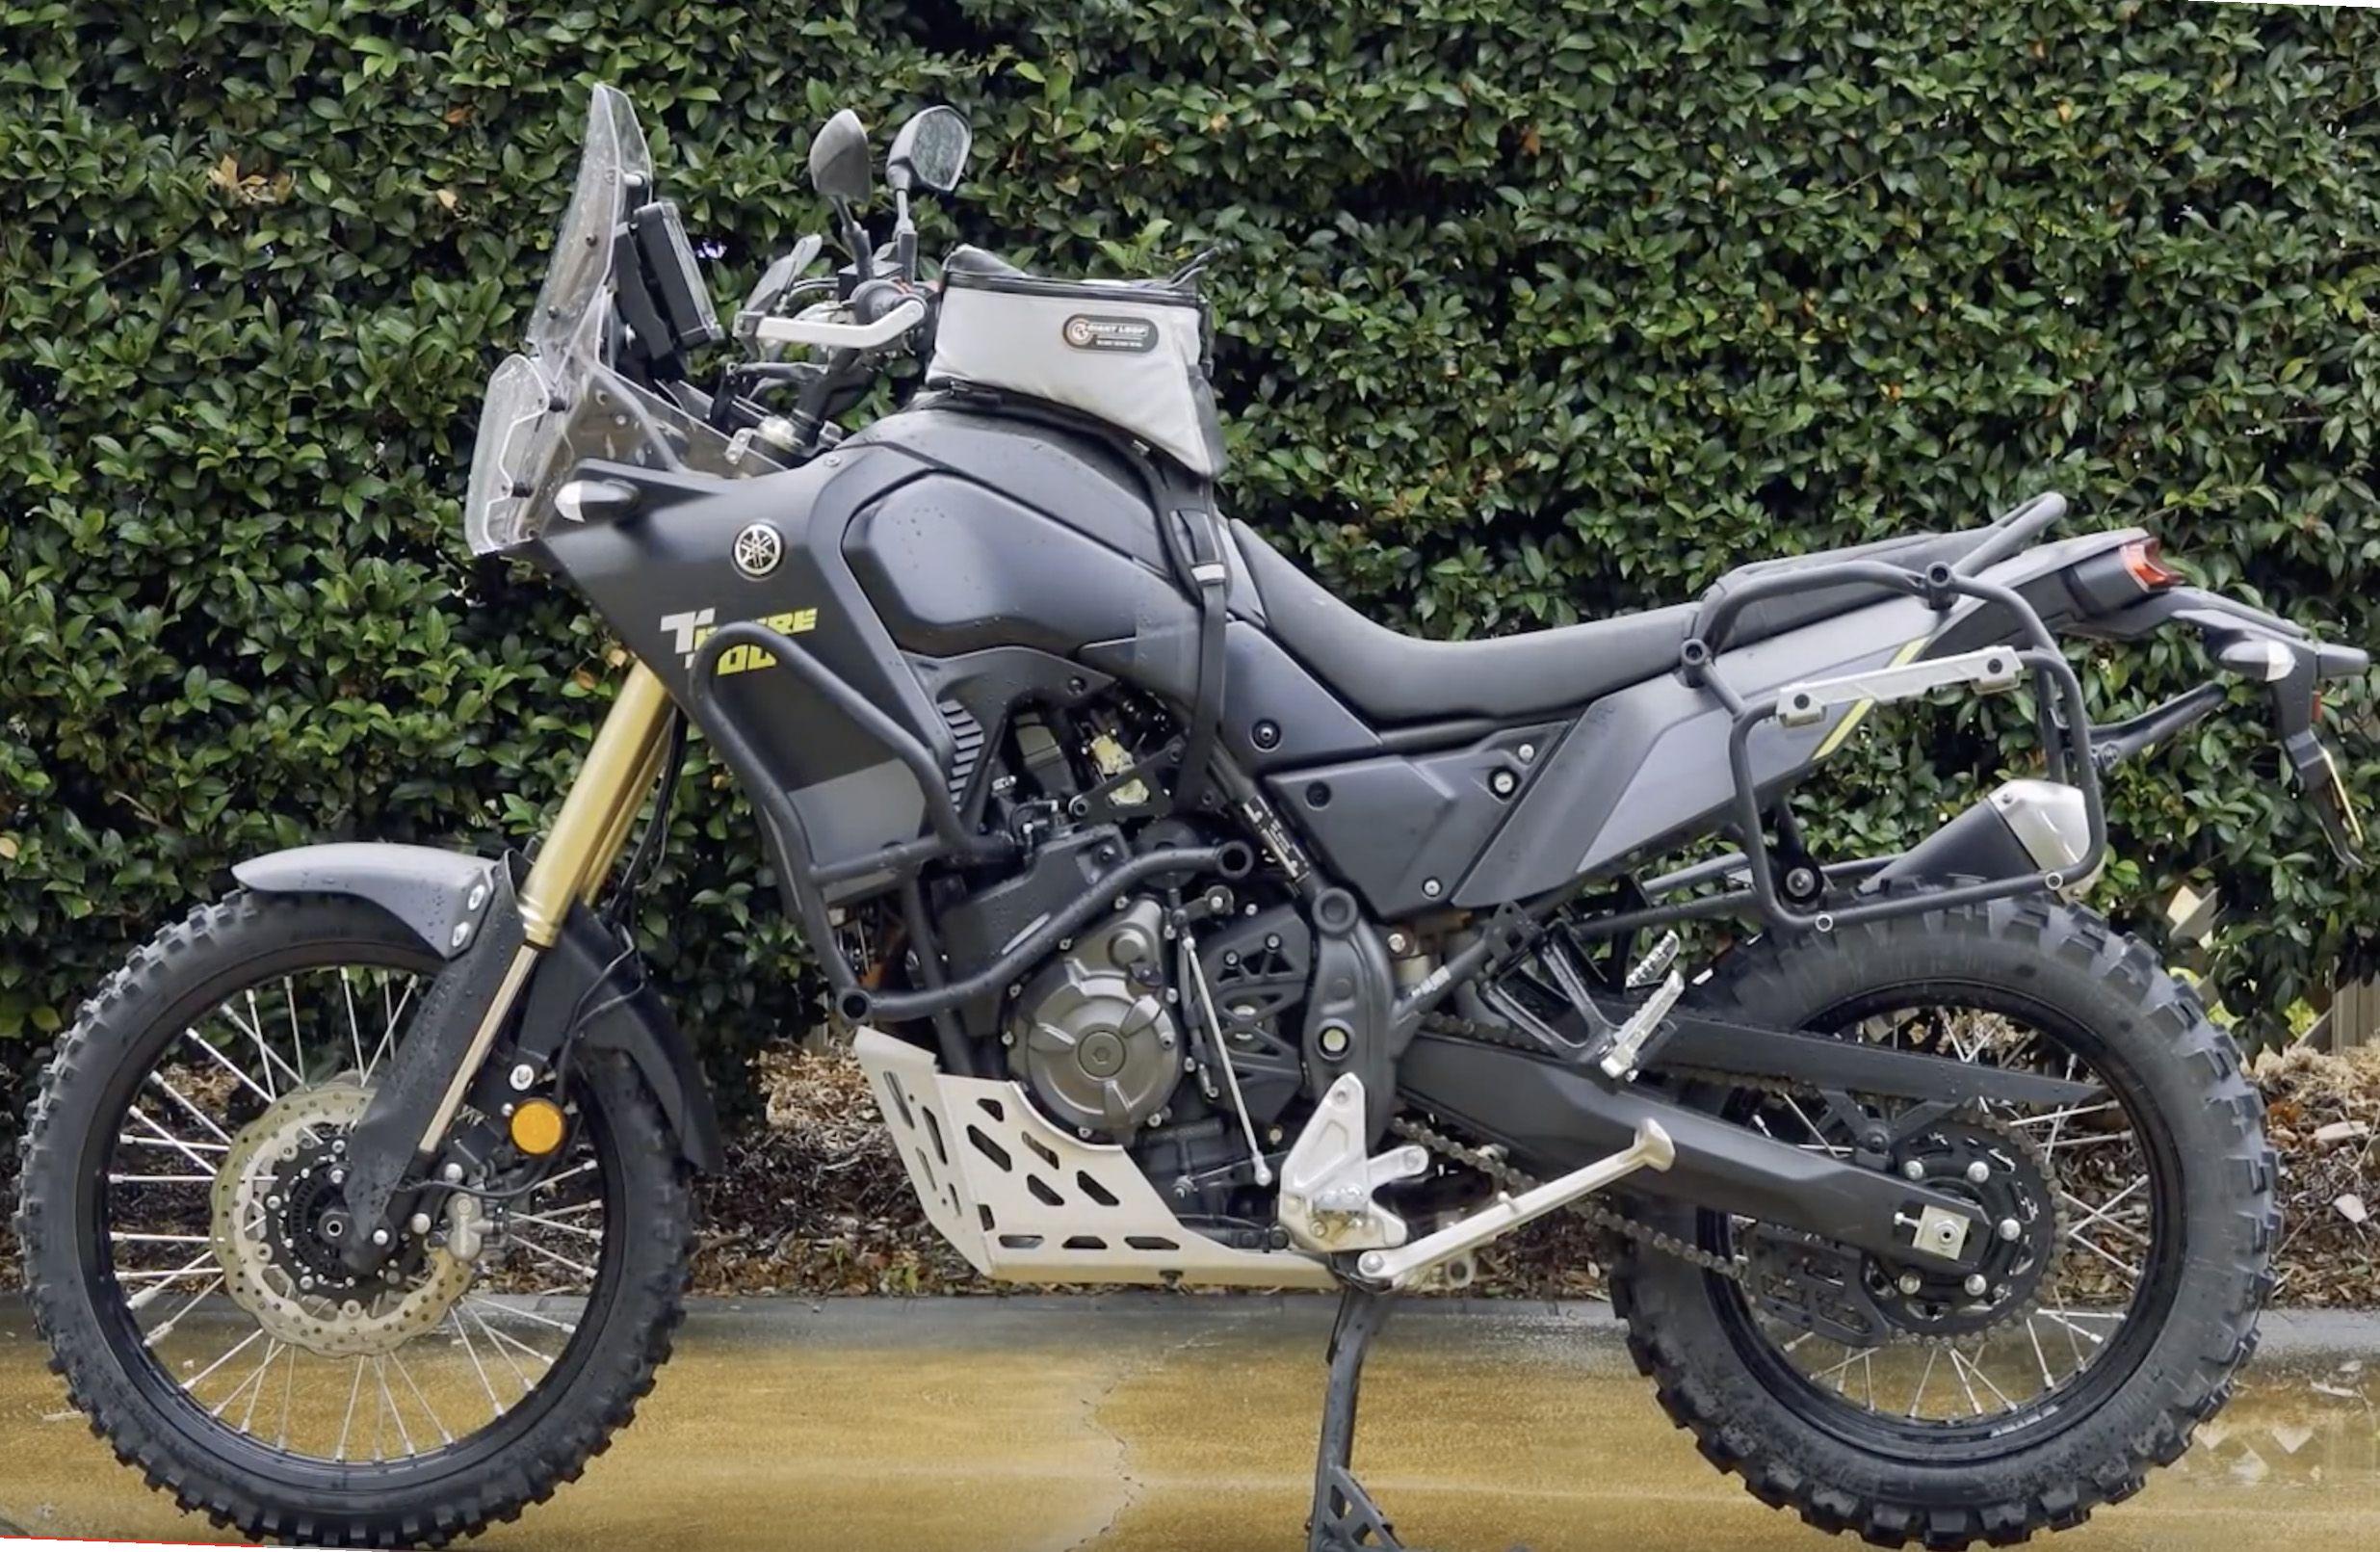 Yamaha Tenere 700 in 2020 Adventure bike, Adventure